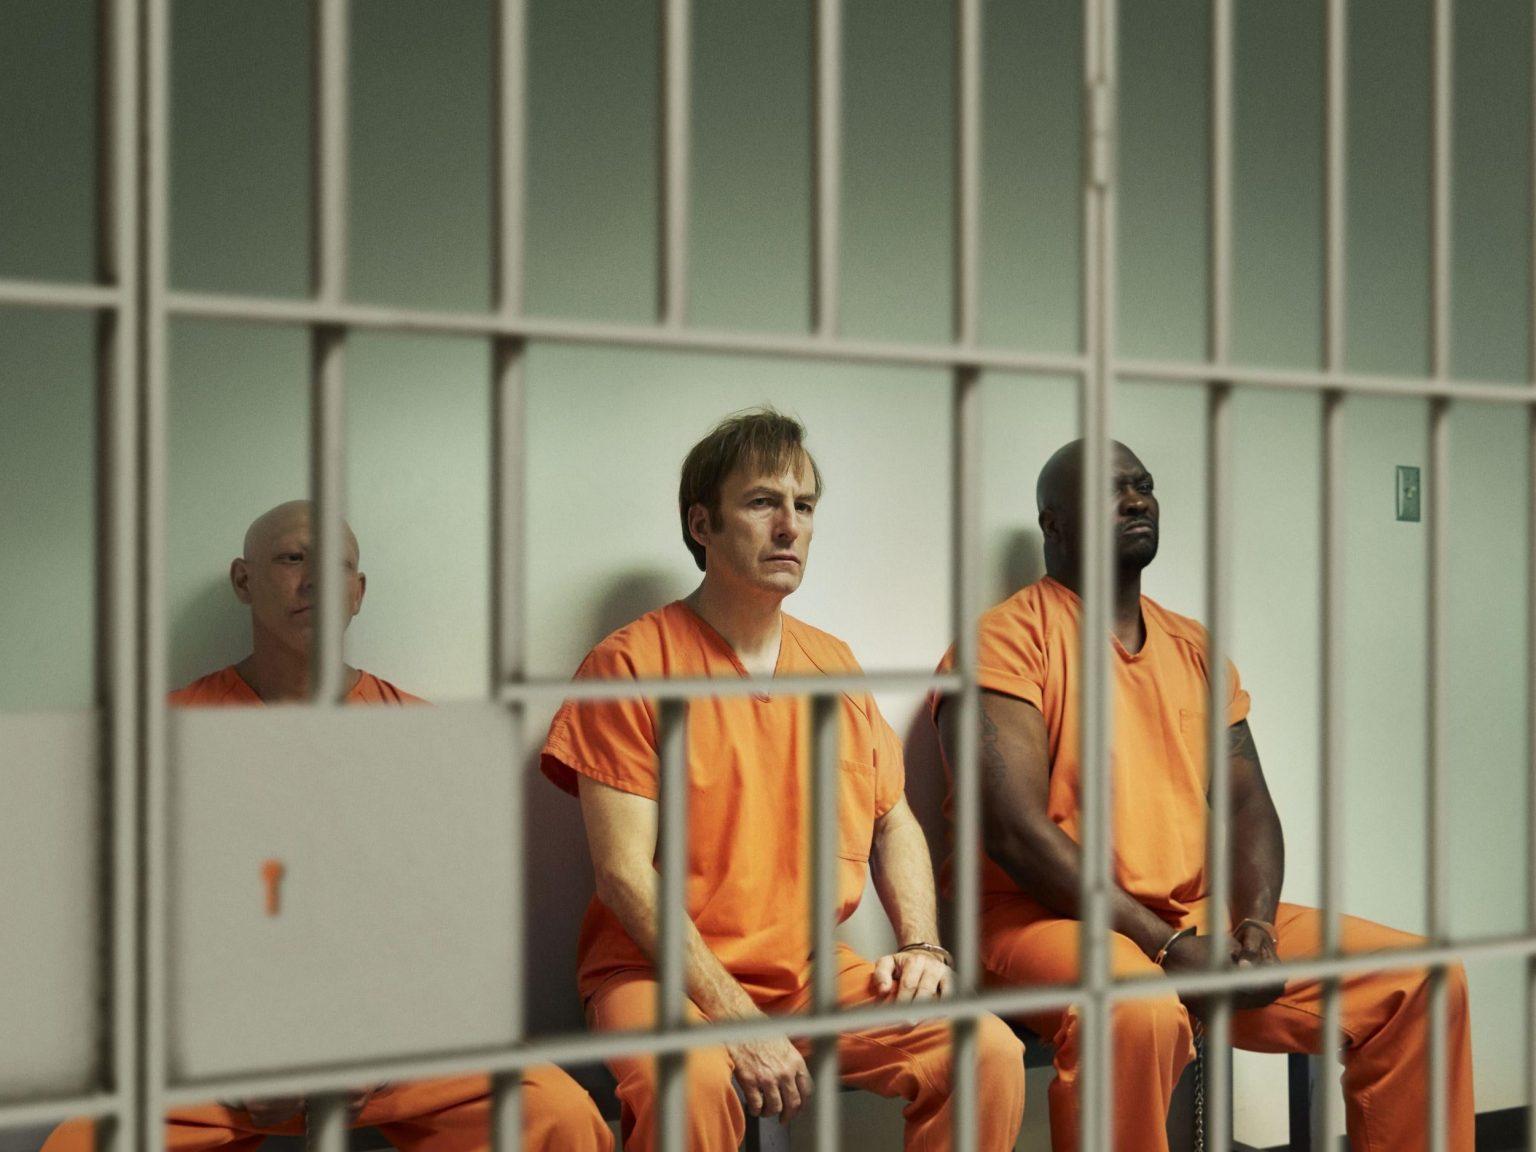 better call saul 1536x1152 1 - نویسنده سریال Better Call Saul: فصل پایانی نگاه بینندگان به Breaking Bad را تغییر میدهد